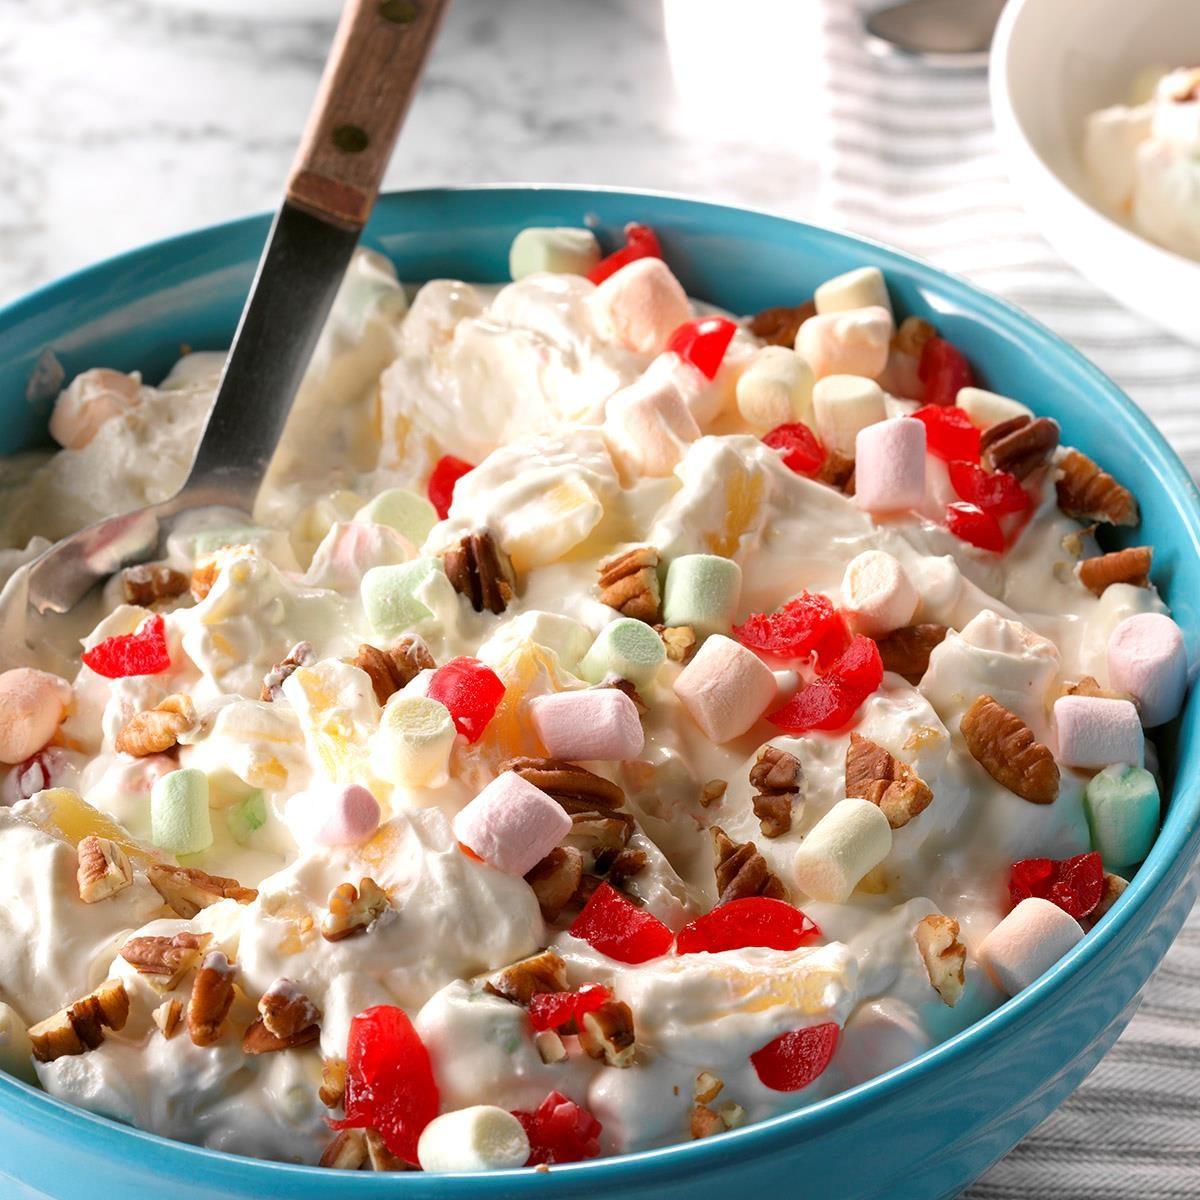 Kentucky: Creamy Pineapple Fluff Salad